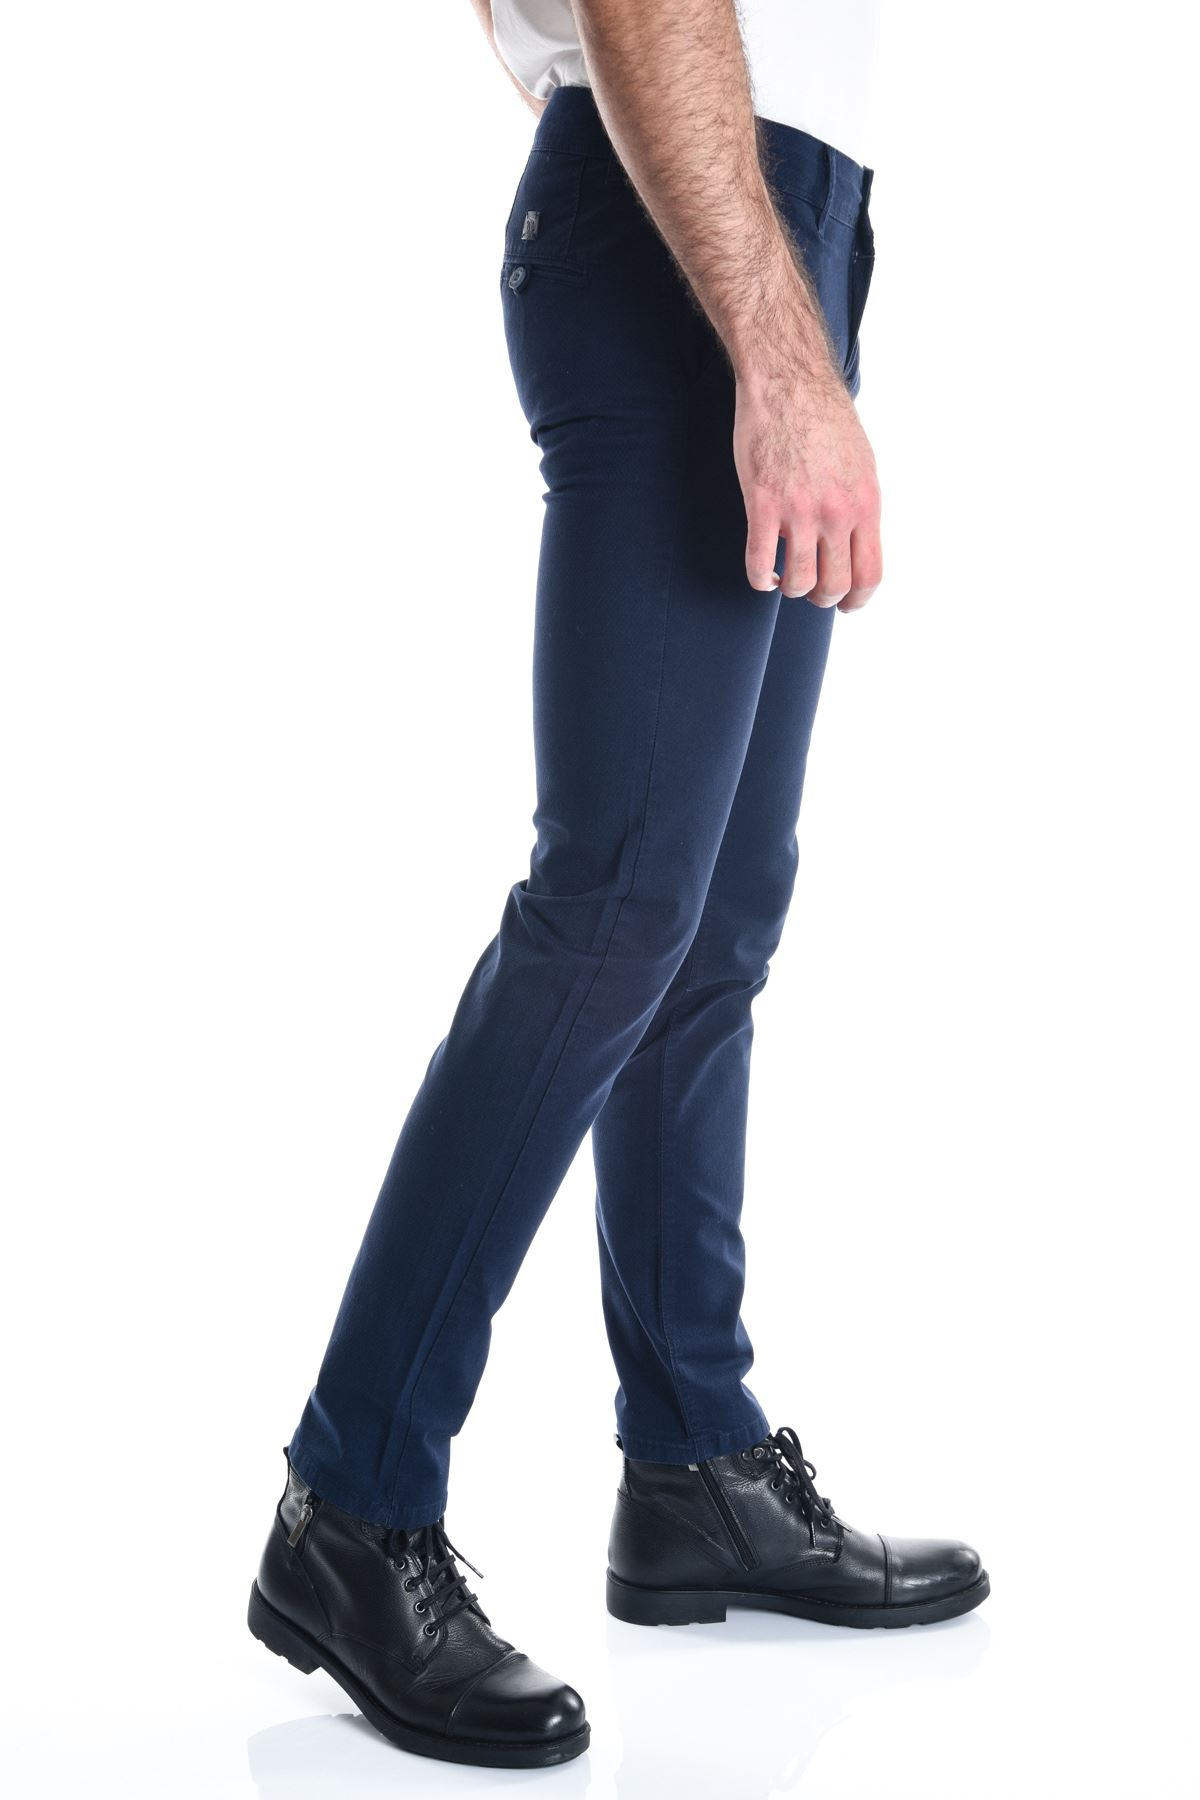 Açık Lacivert Desenli Slimfit Erkek Chino Pantolon